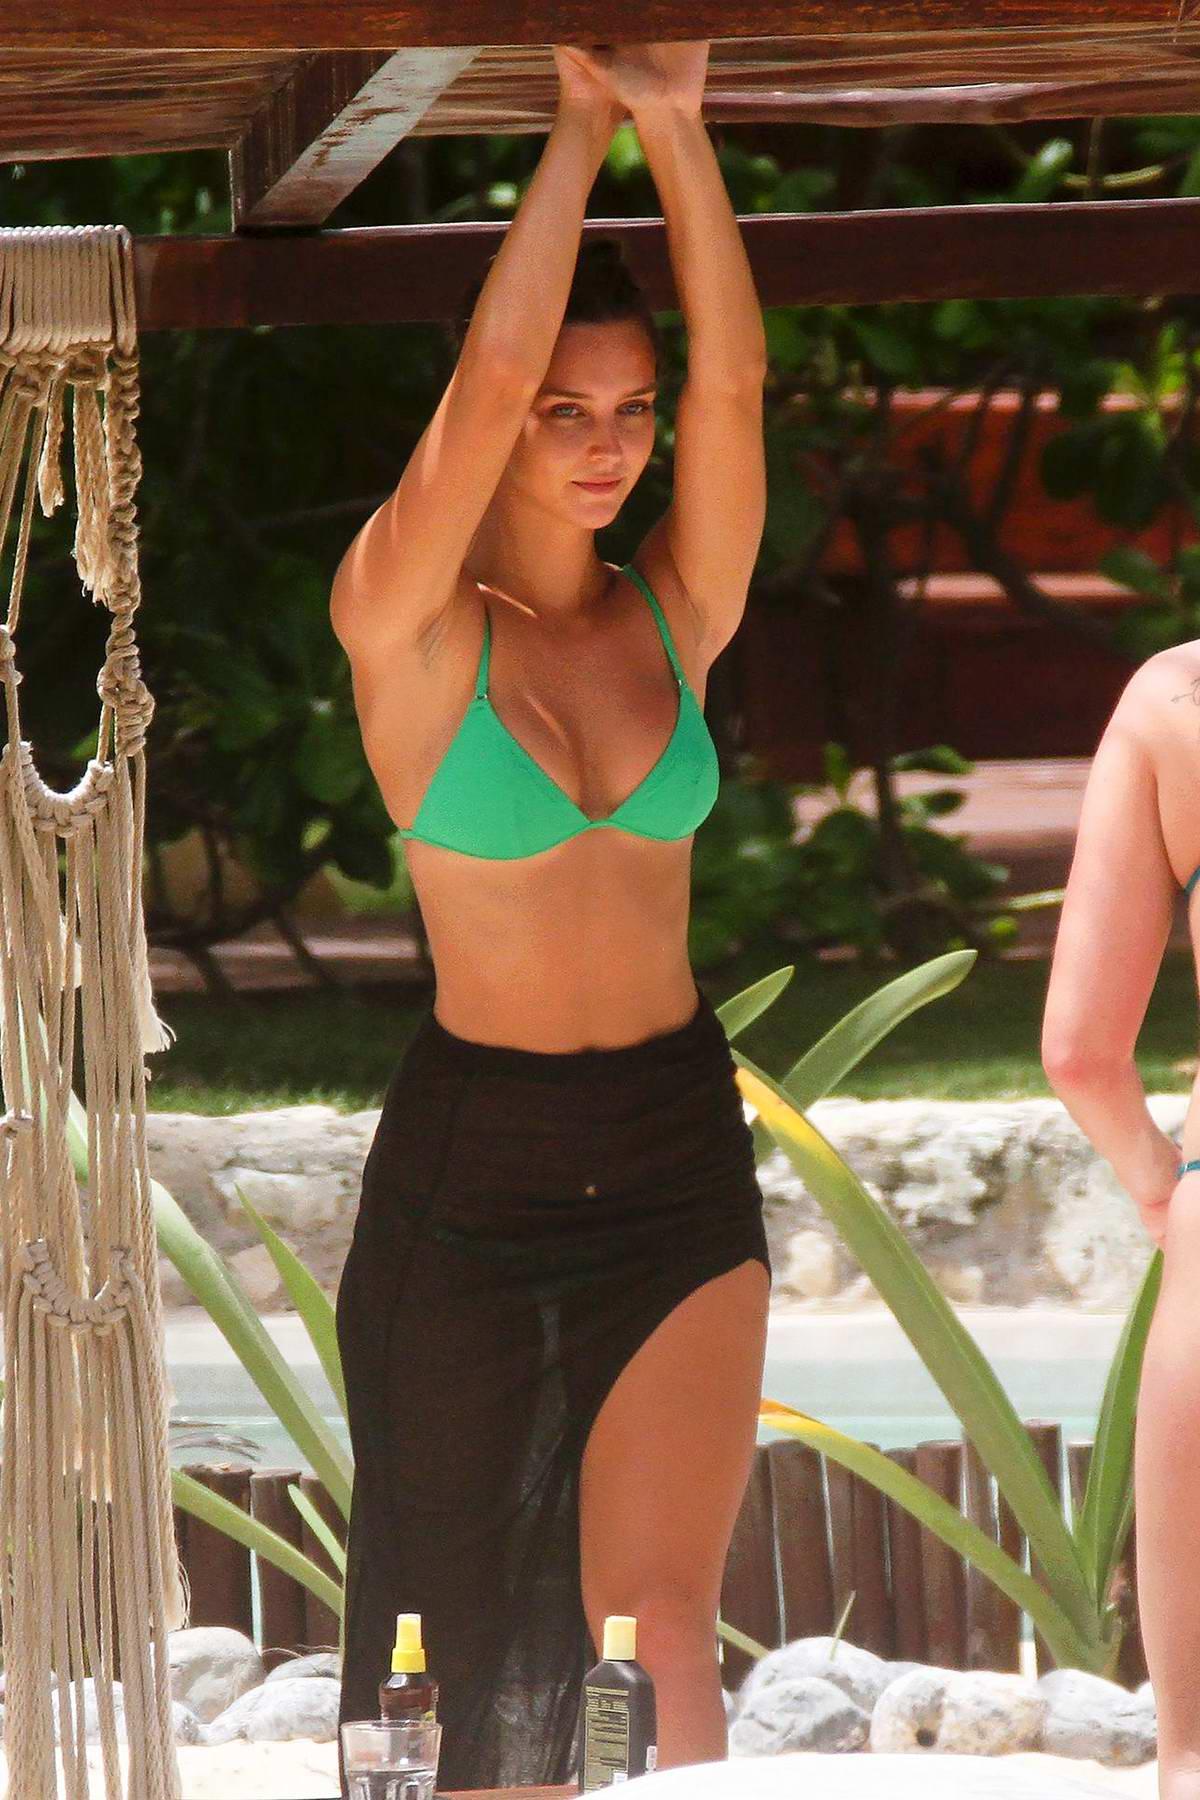 Rachel Cook sports a green bikini while enjoying the sun with boyfriend Tyler Worf in Tulum, Mexico